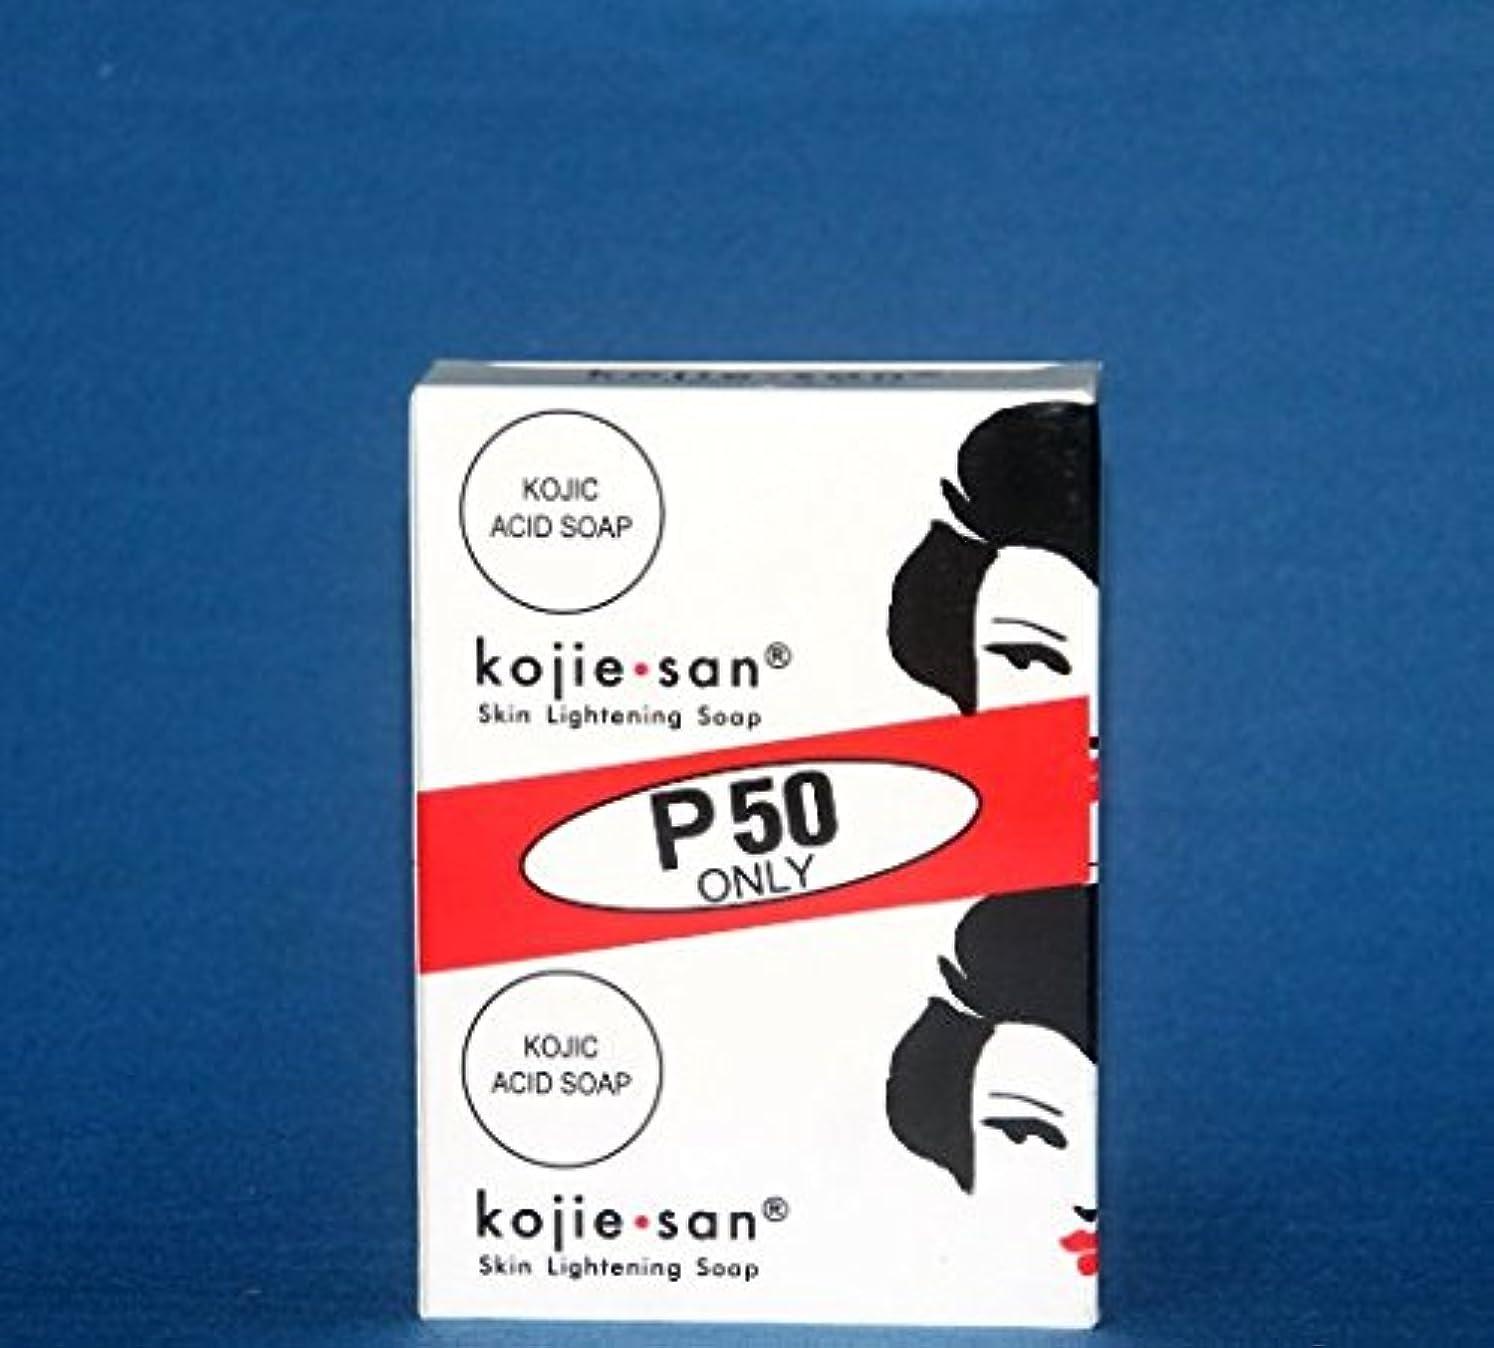 Kojie san Skin Lightening Soap 2 pcs こじえさん スキンライトニングソープ 2個 パック [並行輸入品]